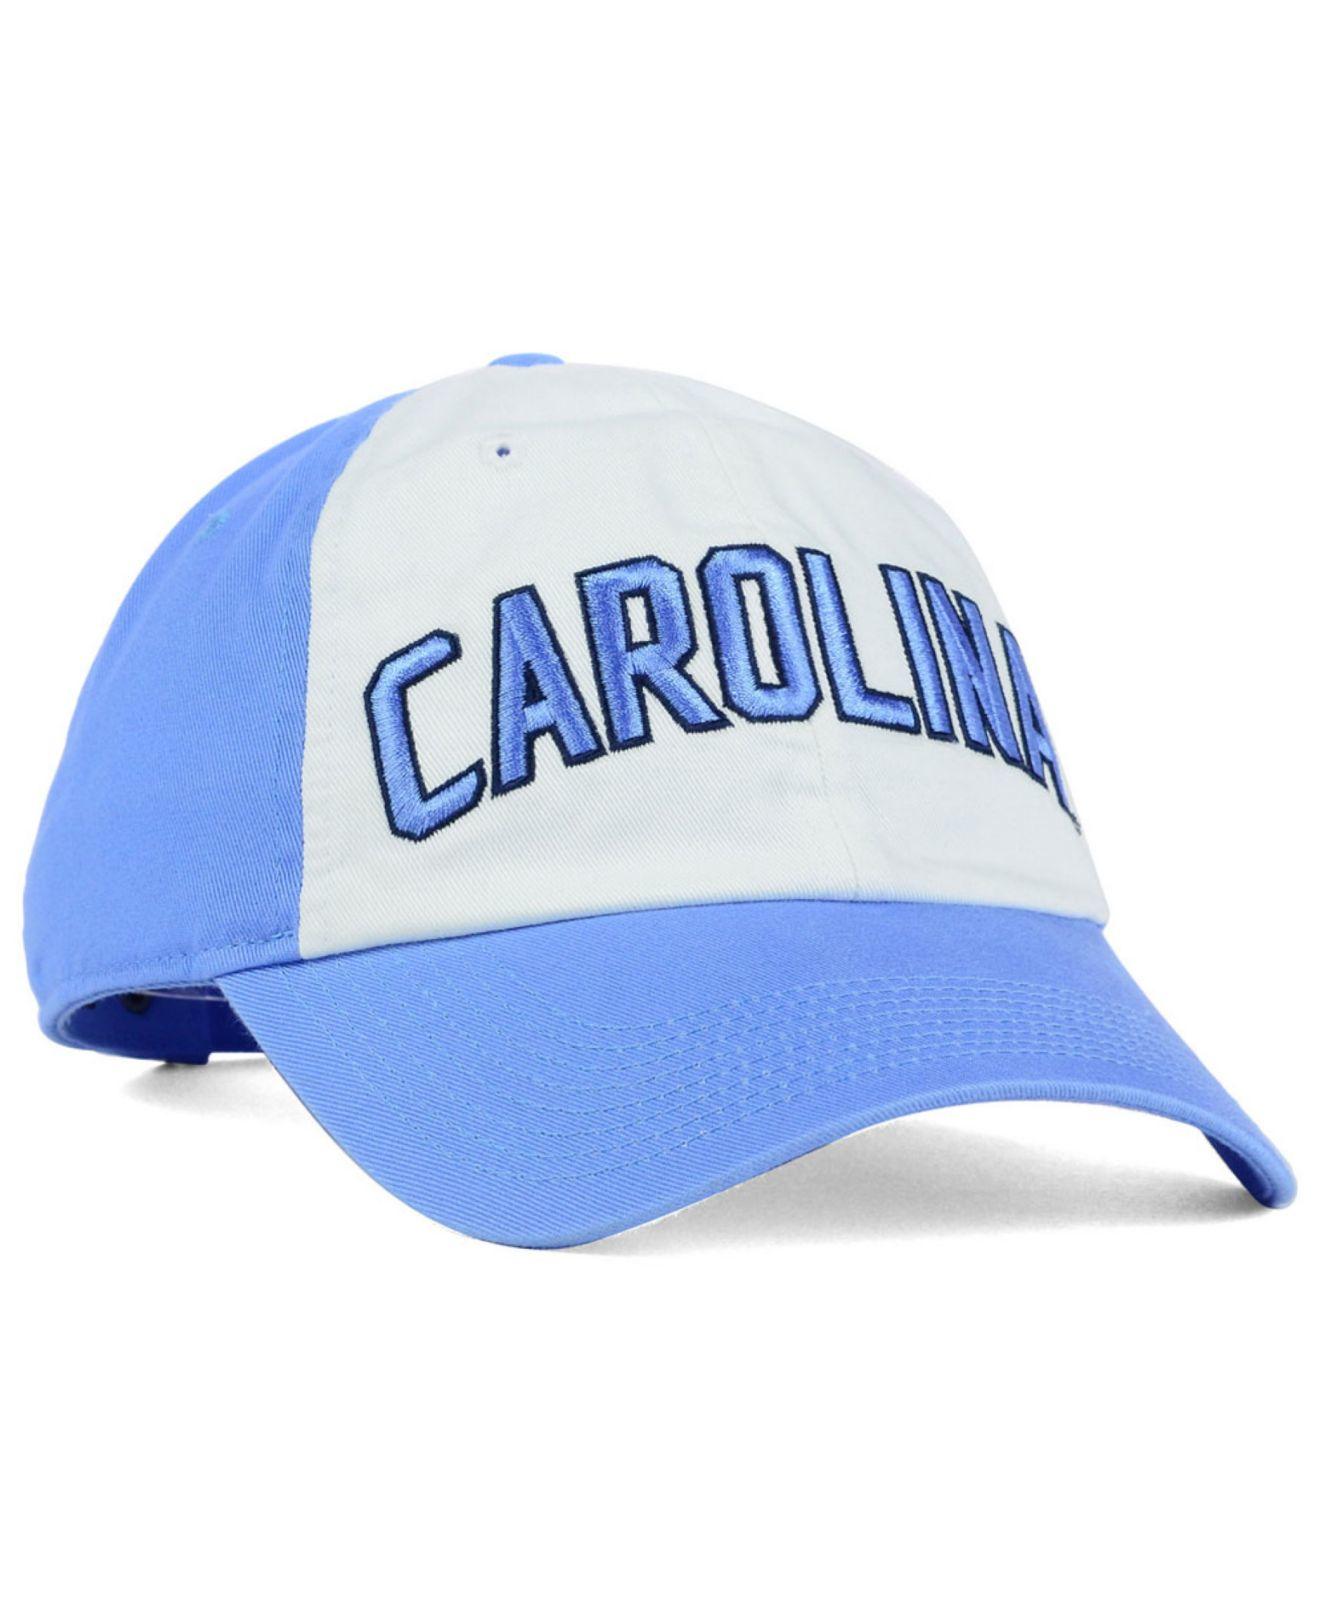 sale retailer 750a8 e8e38 Nike North Carolina Tar Heels Heritage 86 Wordmark Cap in Blue for ...